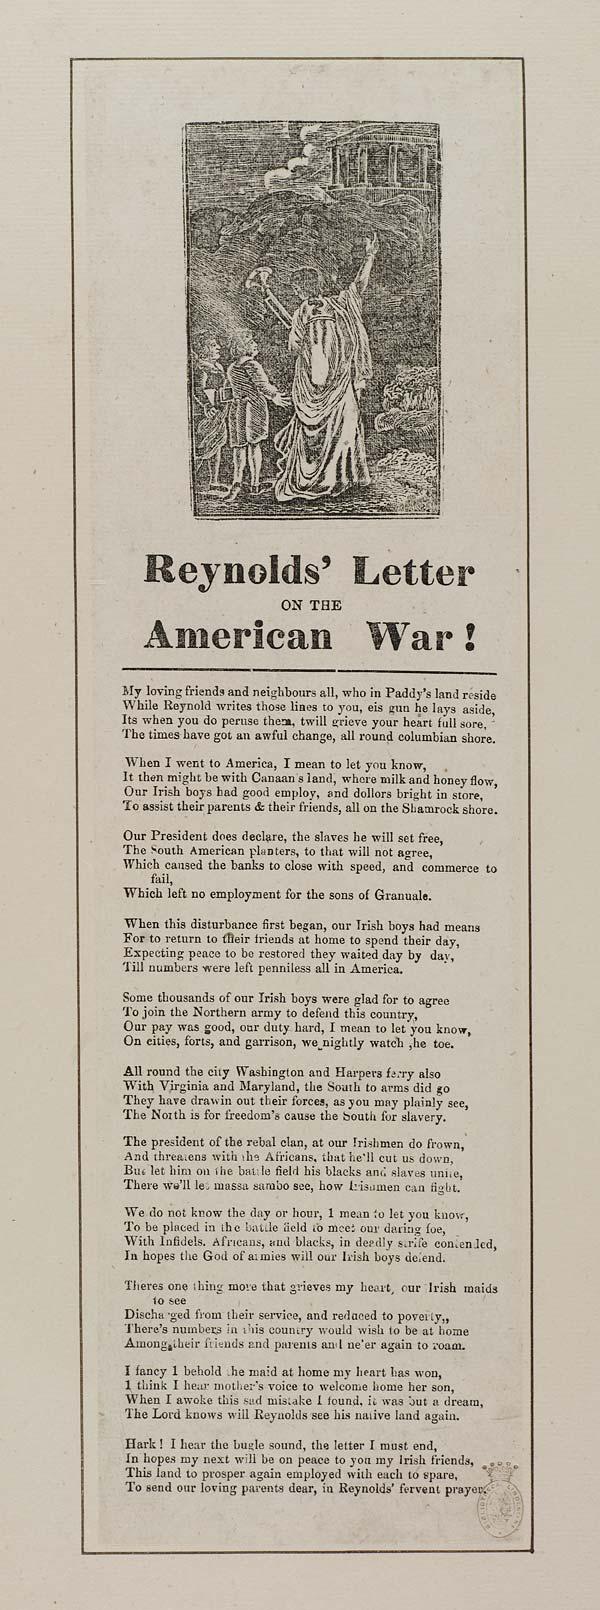 (13) Reynolds' letter on the American war